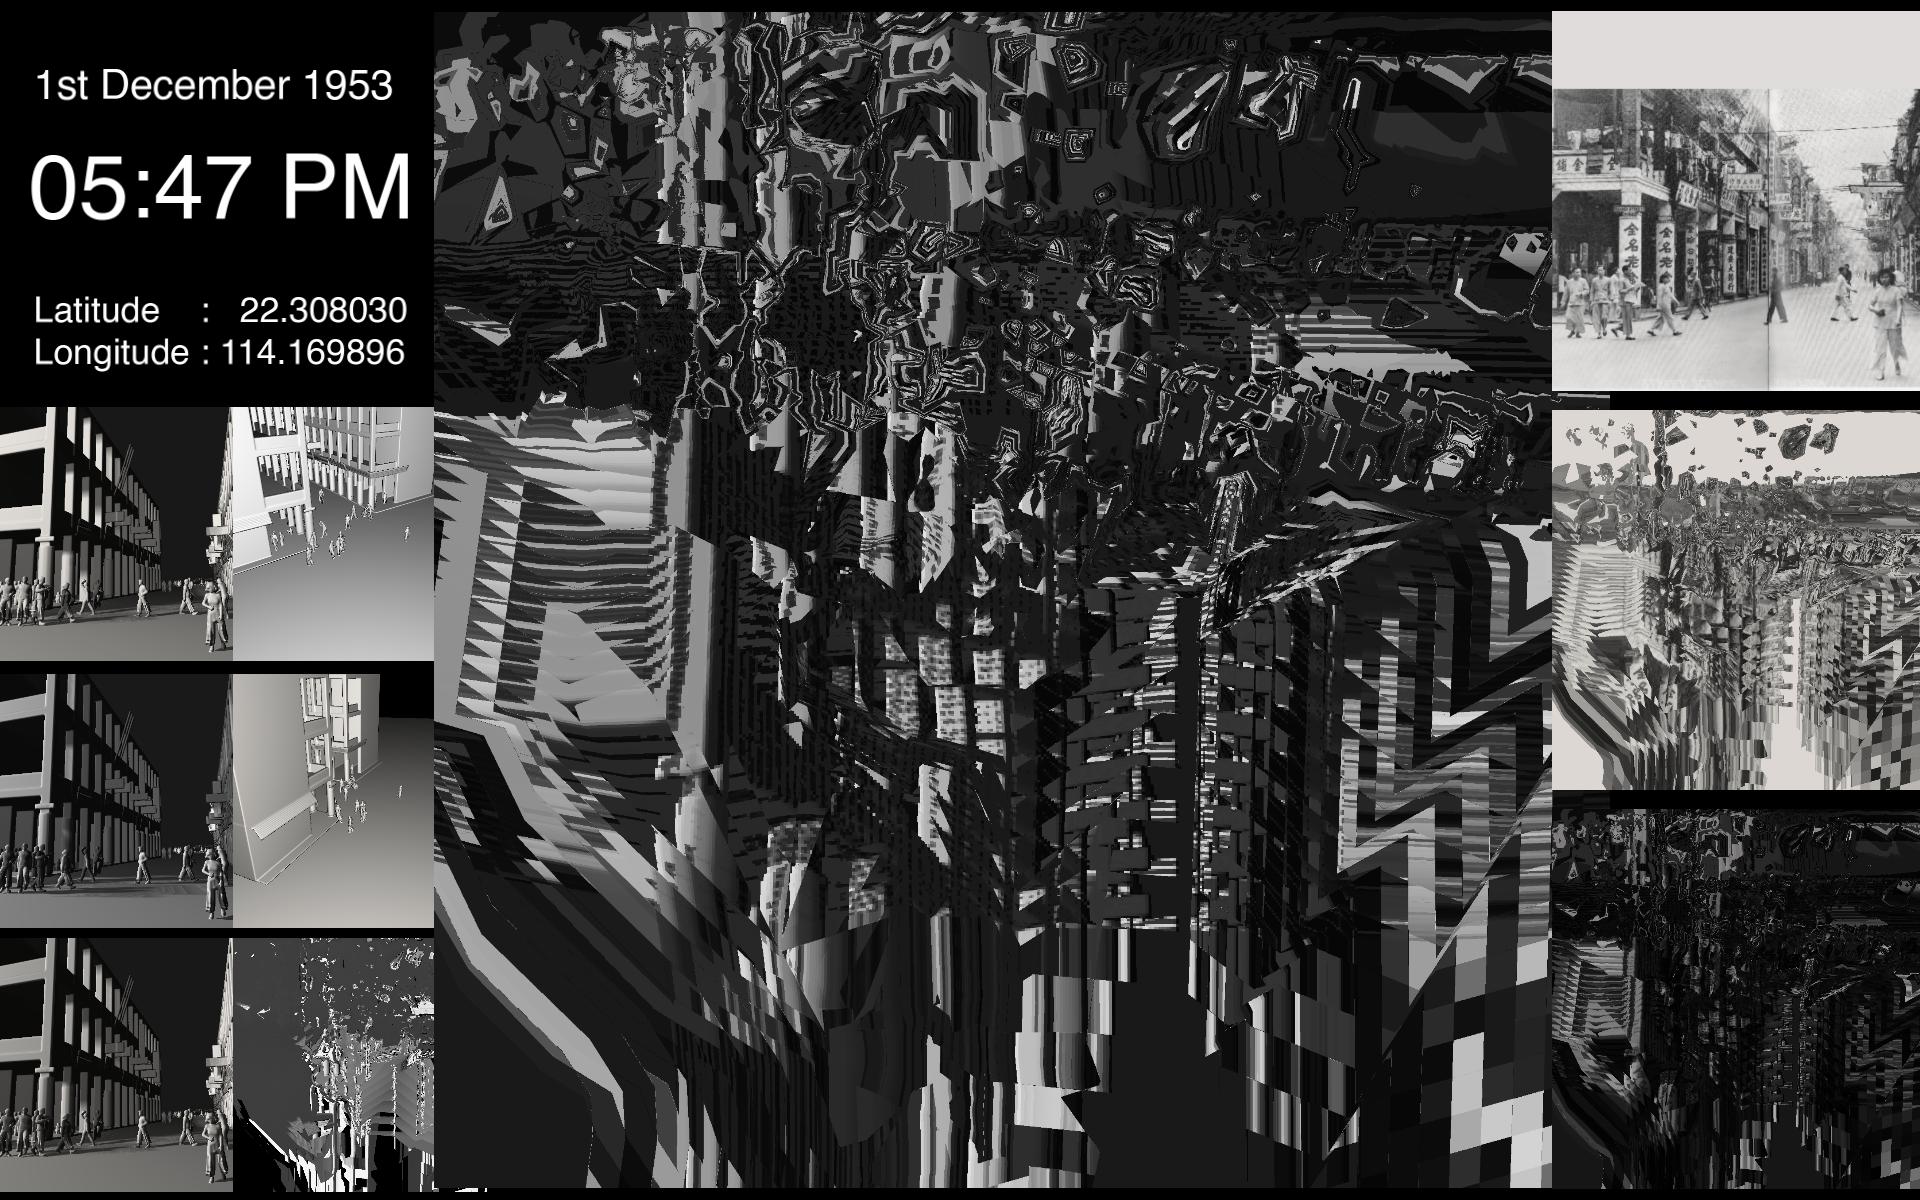 Desktop 2019-03-09 13-57-14.png